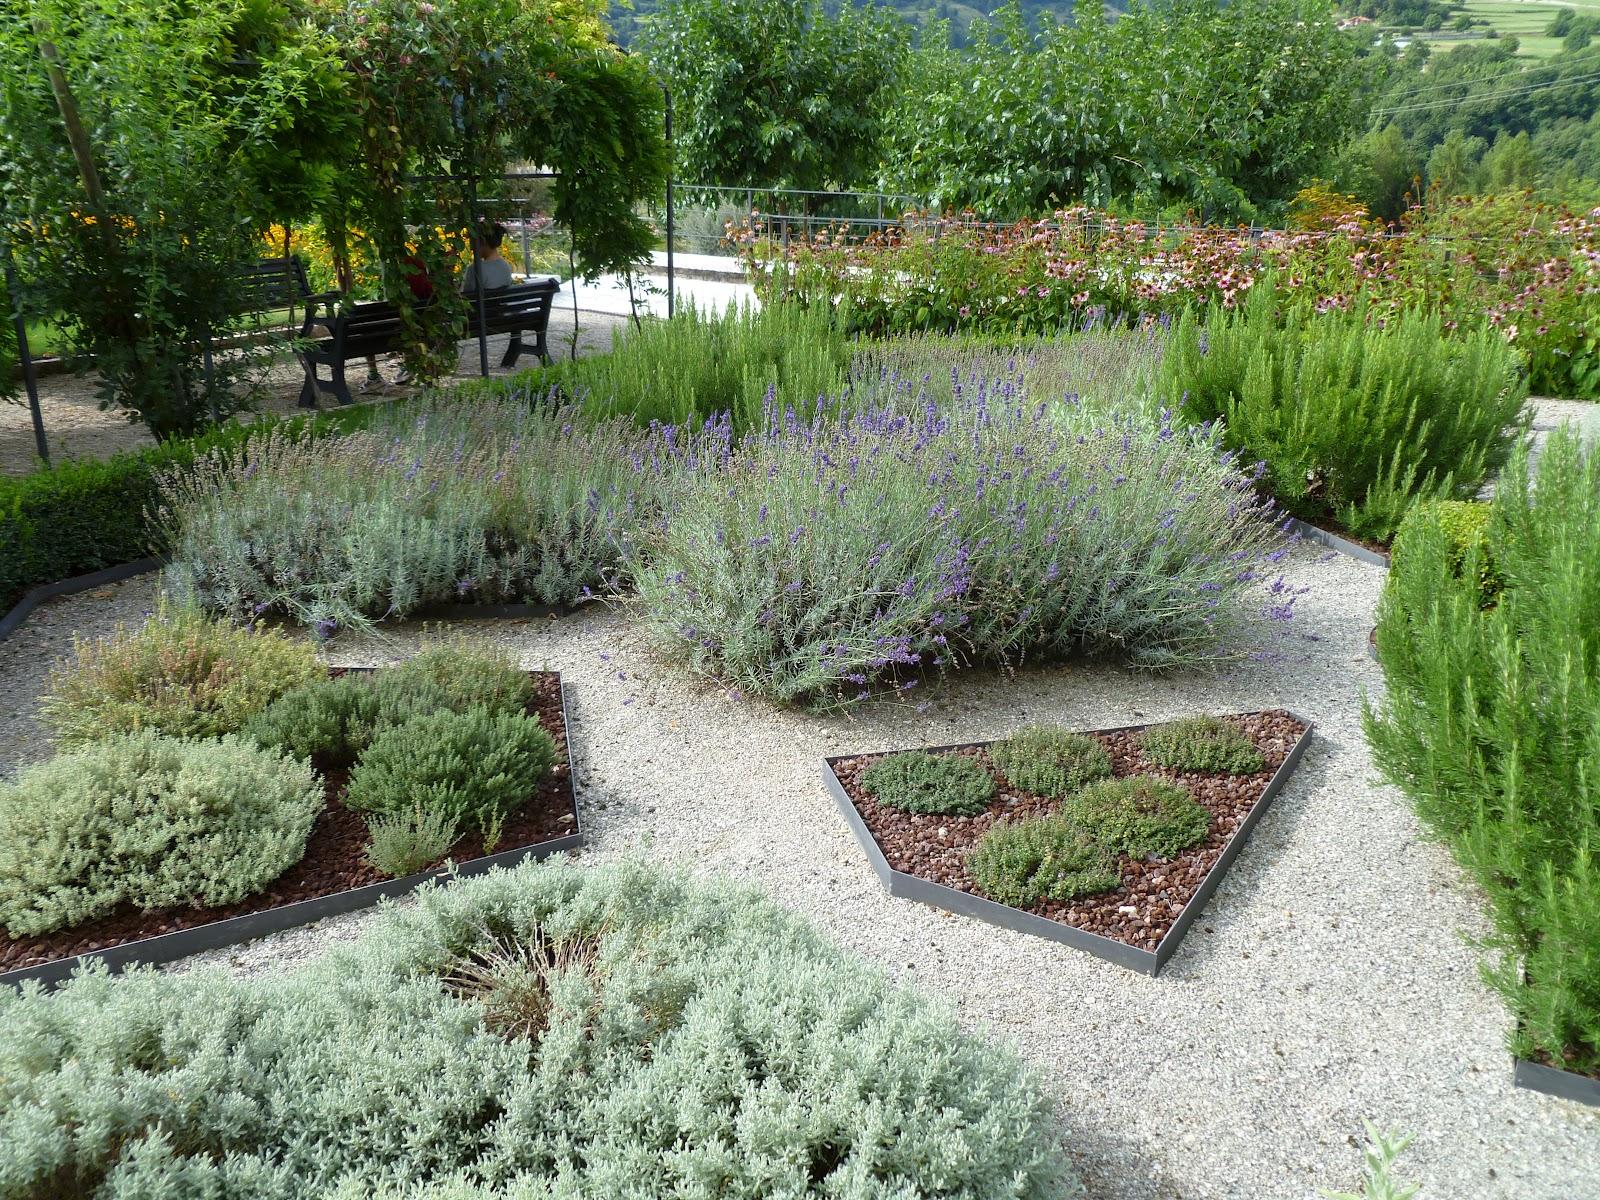 Pozzi Decorativi Da Giardino : Pozzi da giardino ornamentali fontana vedovella l aquila kam